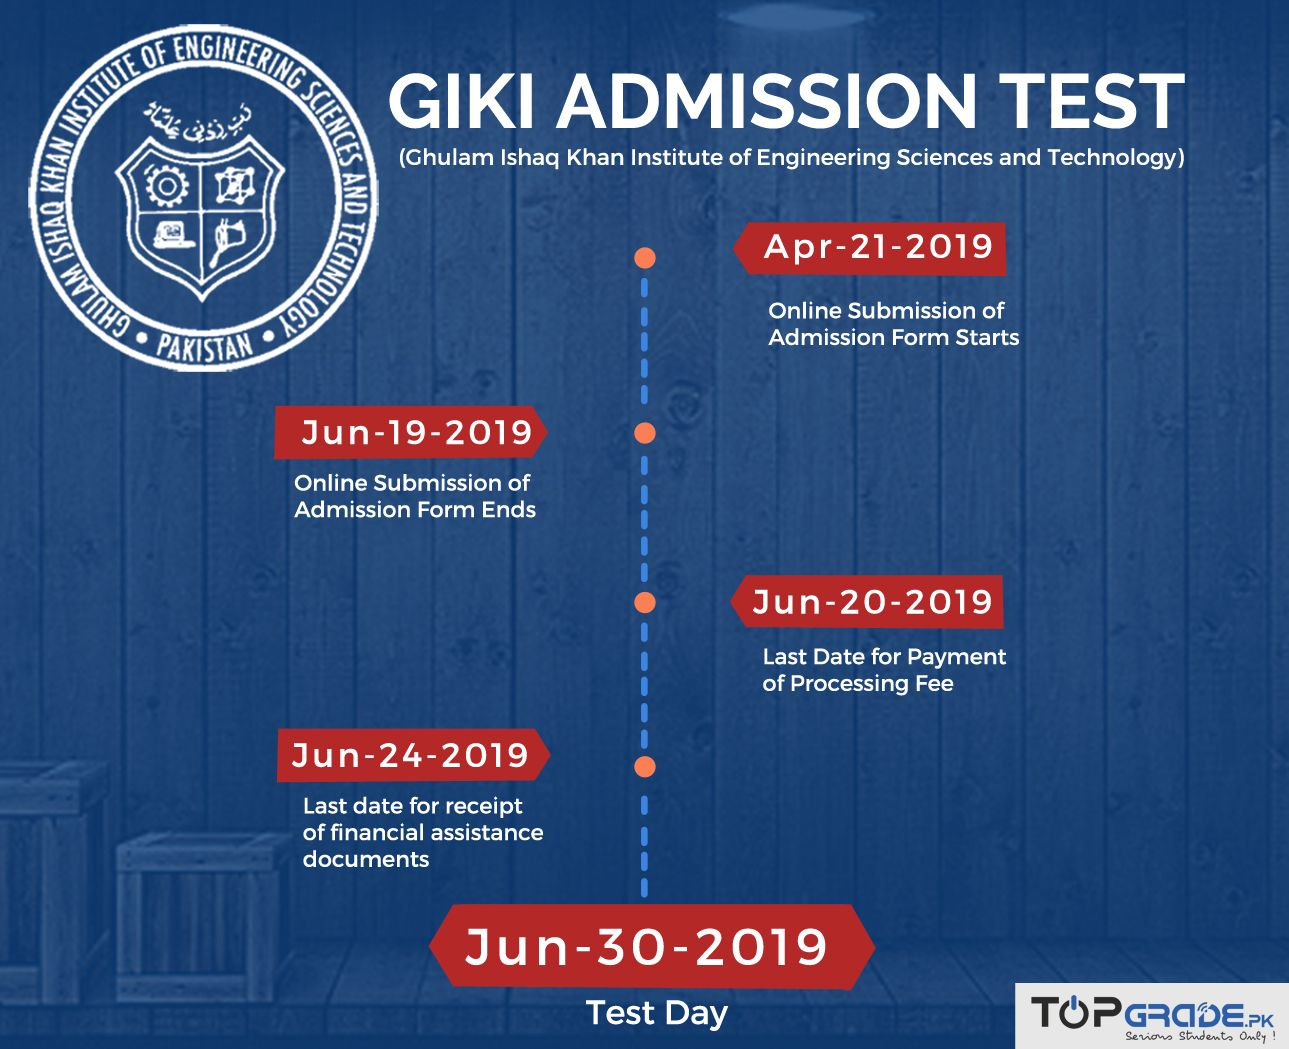 645cf3d4c4d21a9f886a4ef0834630d6 - How To Get Admission In Aga Khan Medical College